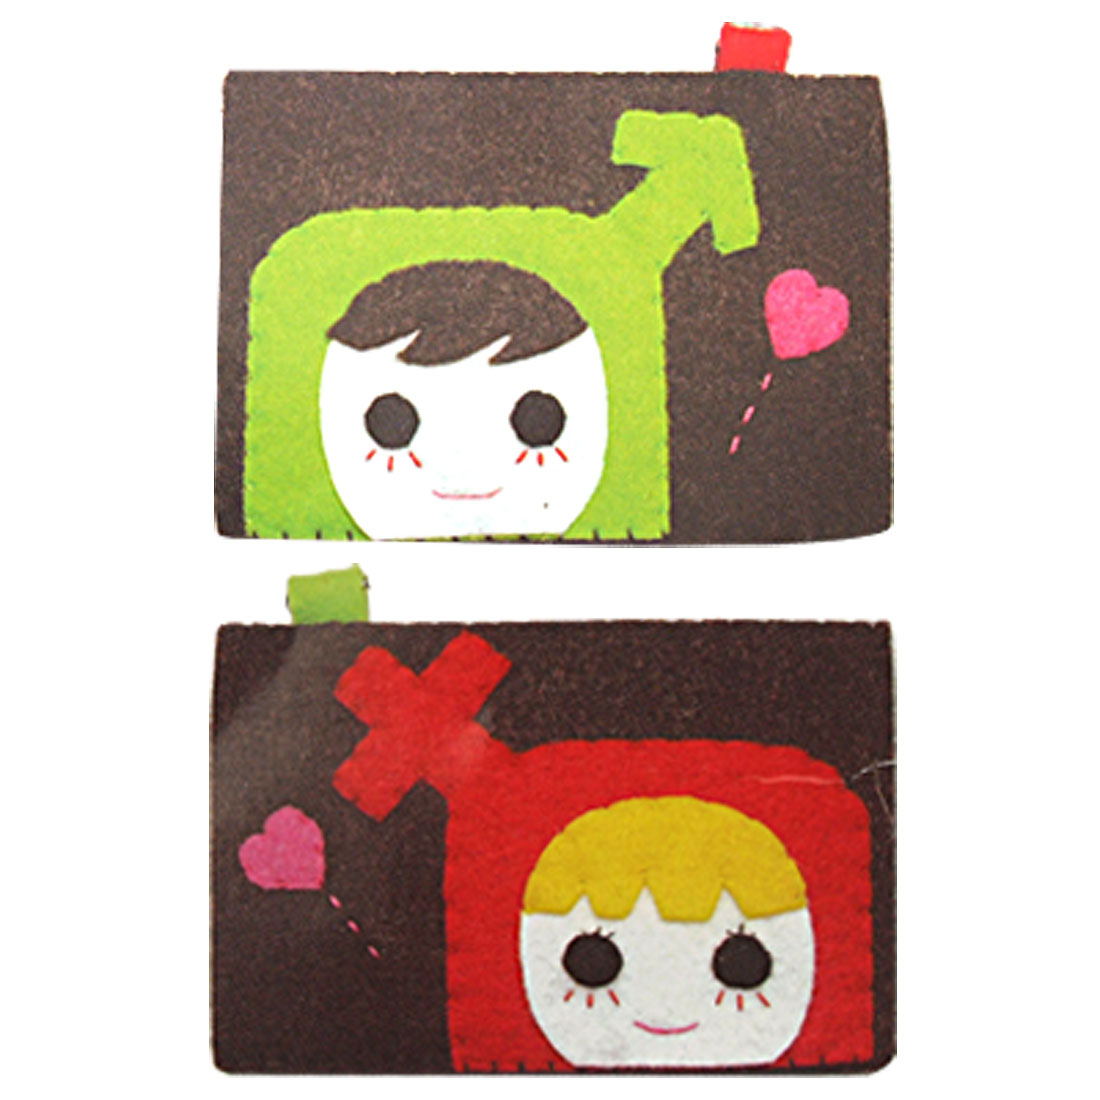 Girl Pattern Fabric Stitch Handicraft Business Credit Card Holder